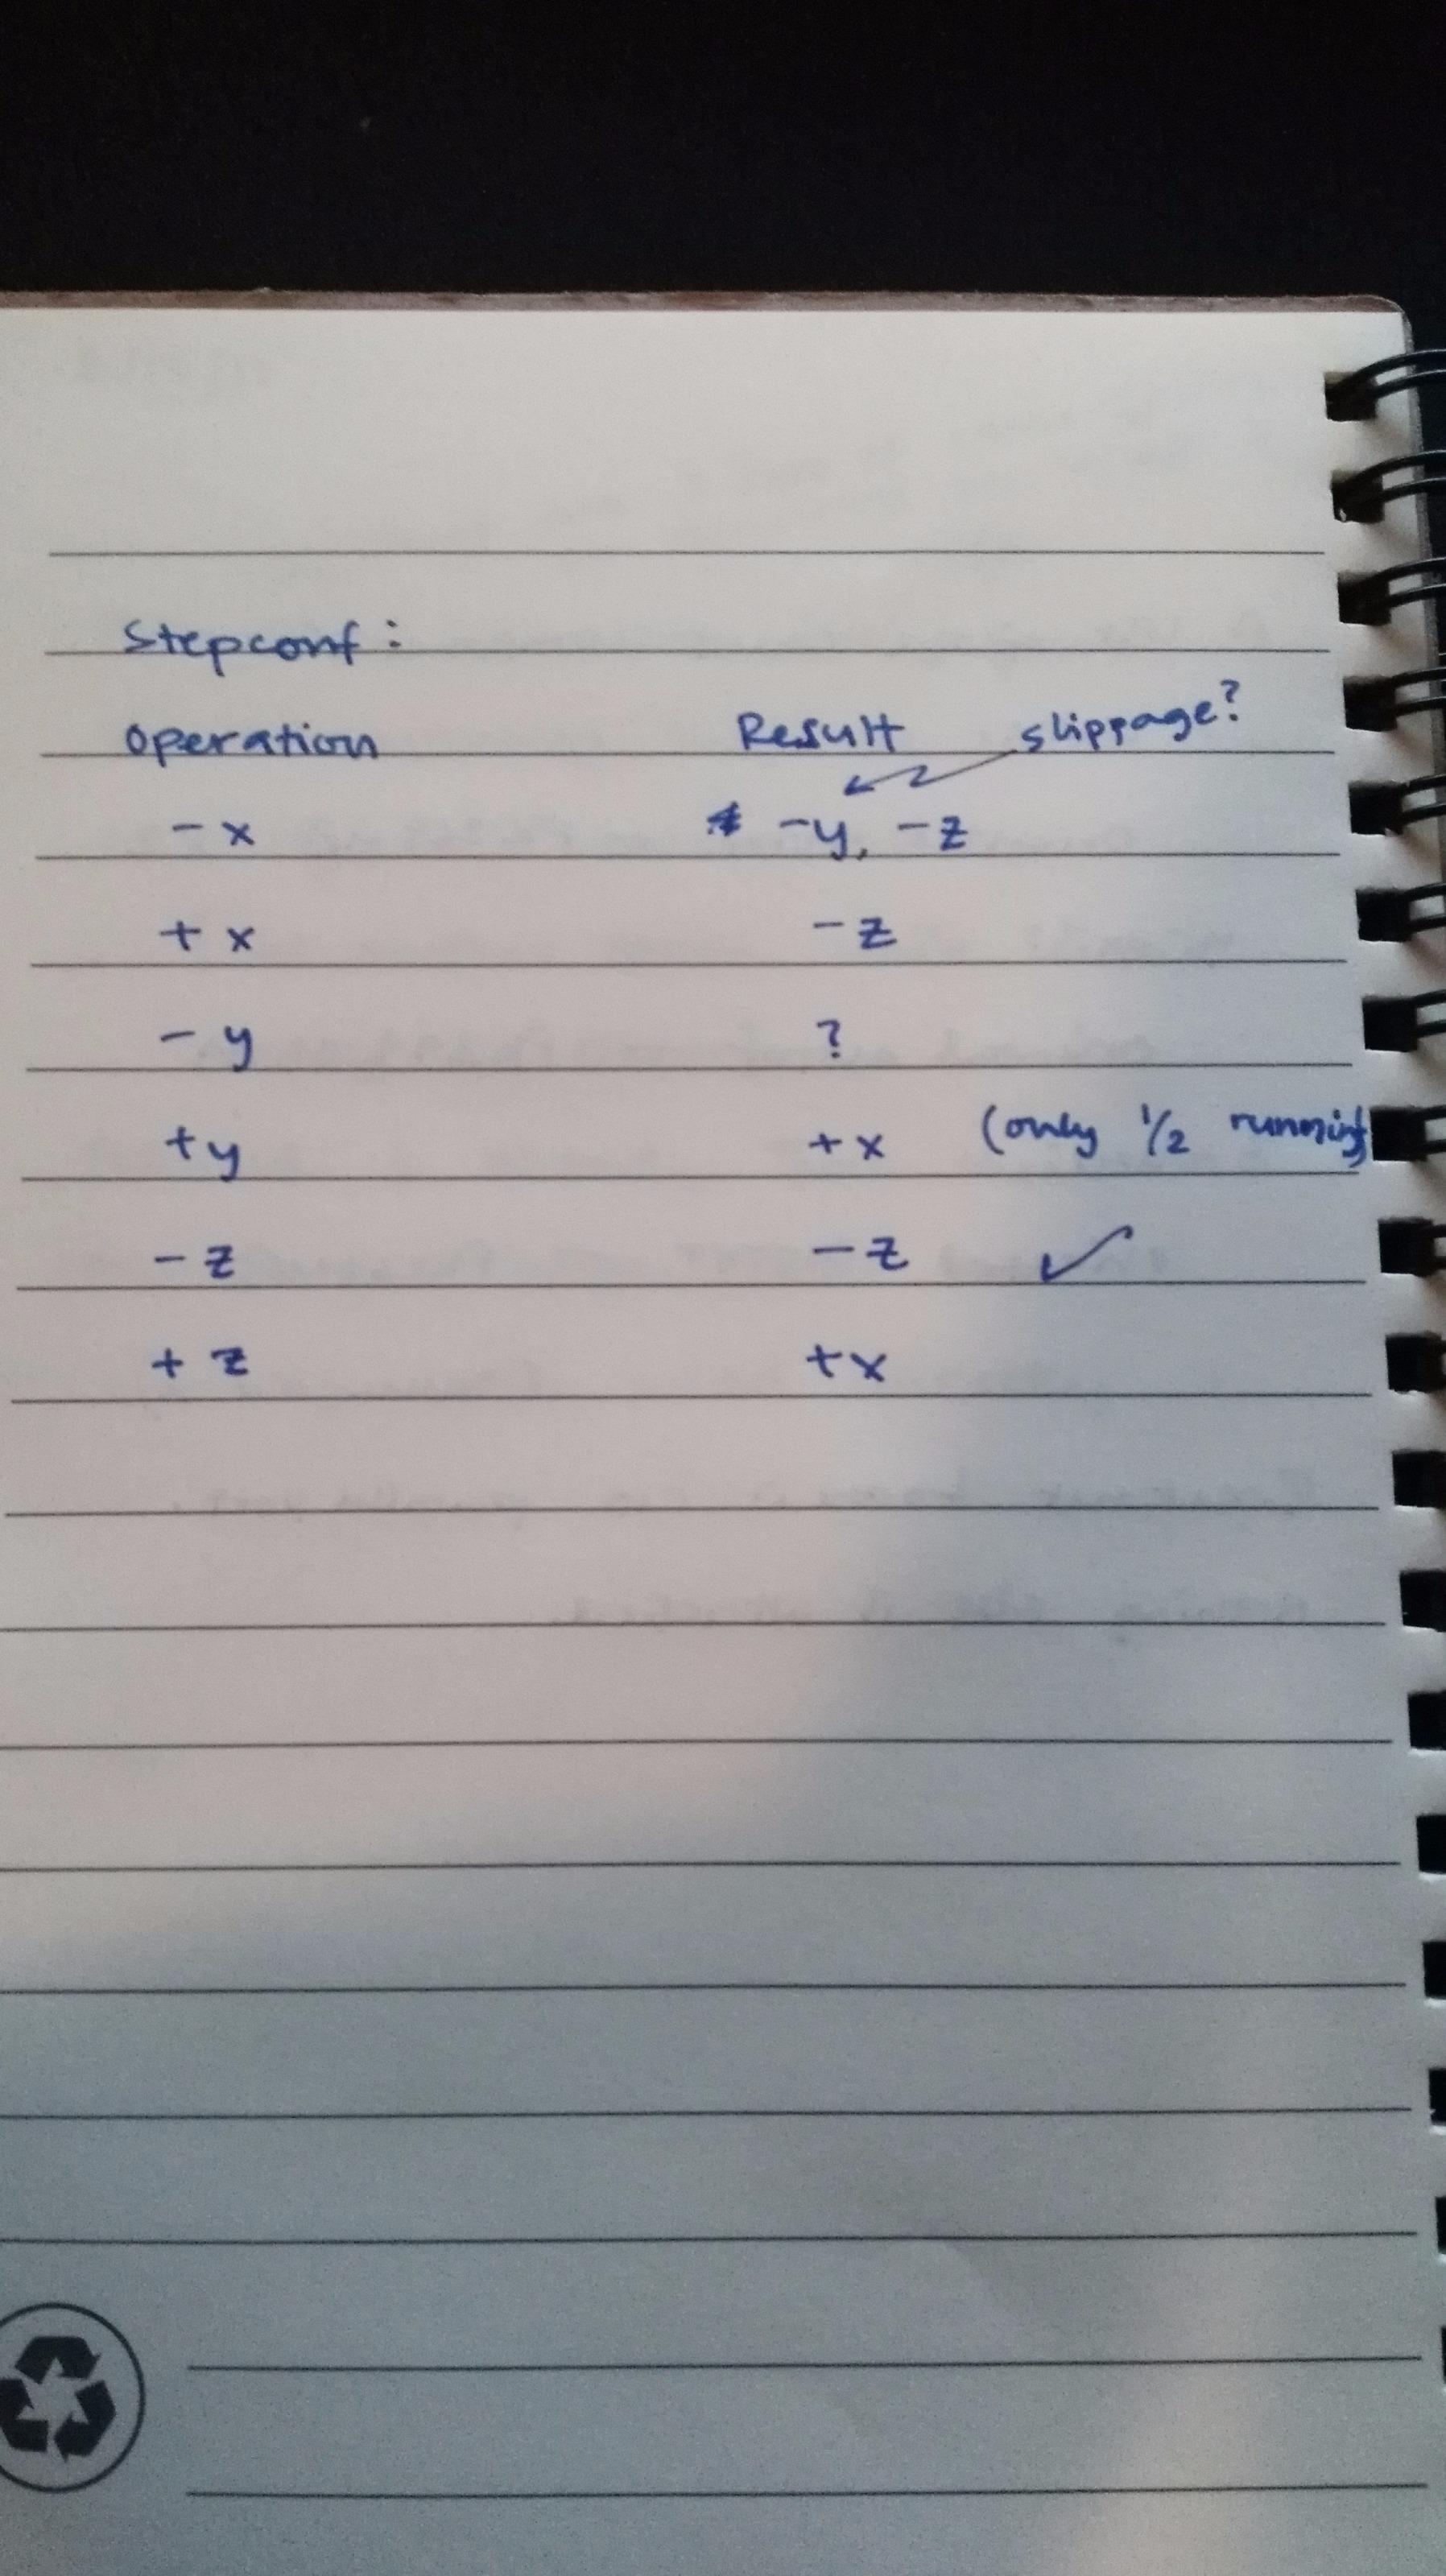 CNCStepconfOperationResults.jpg